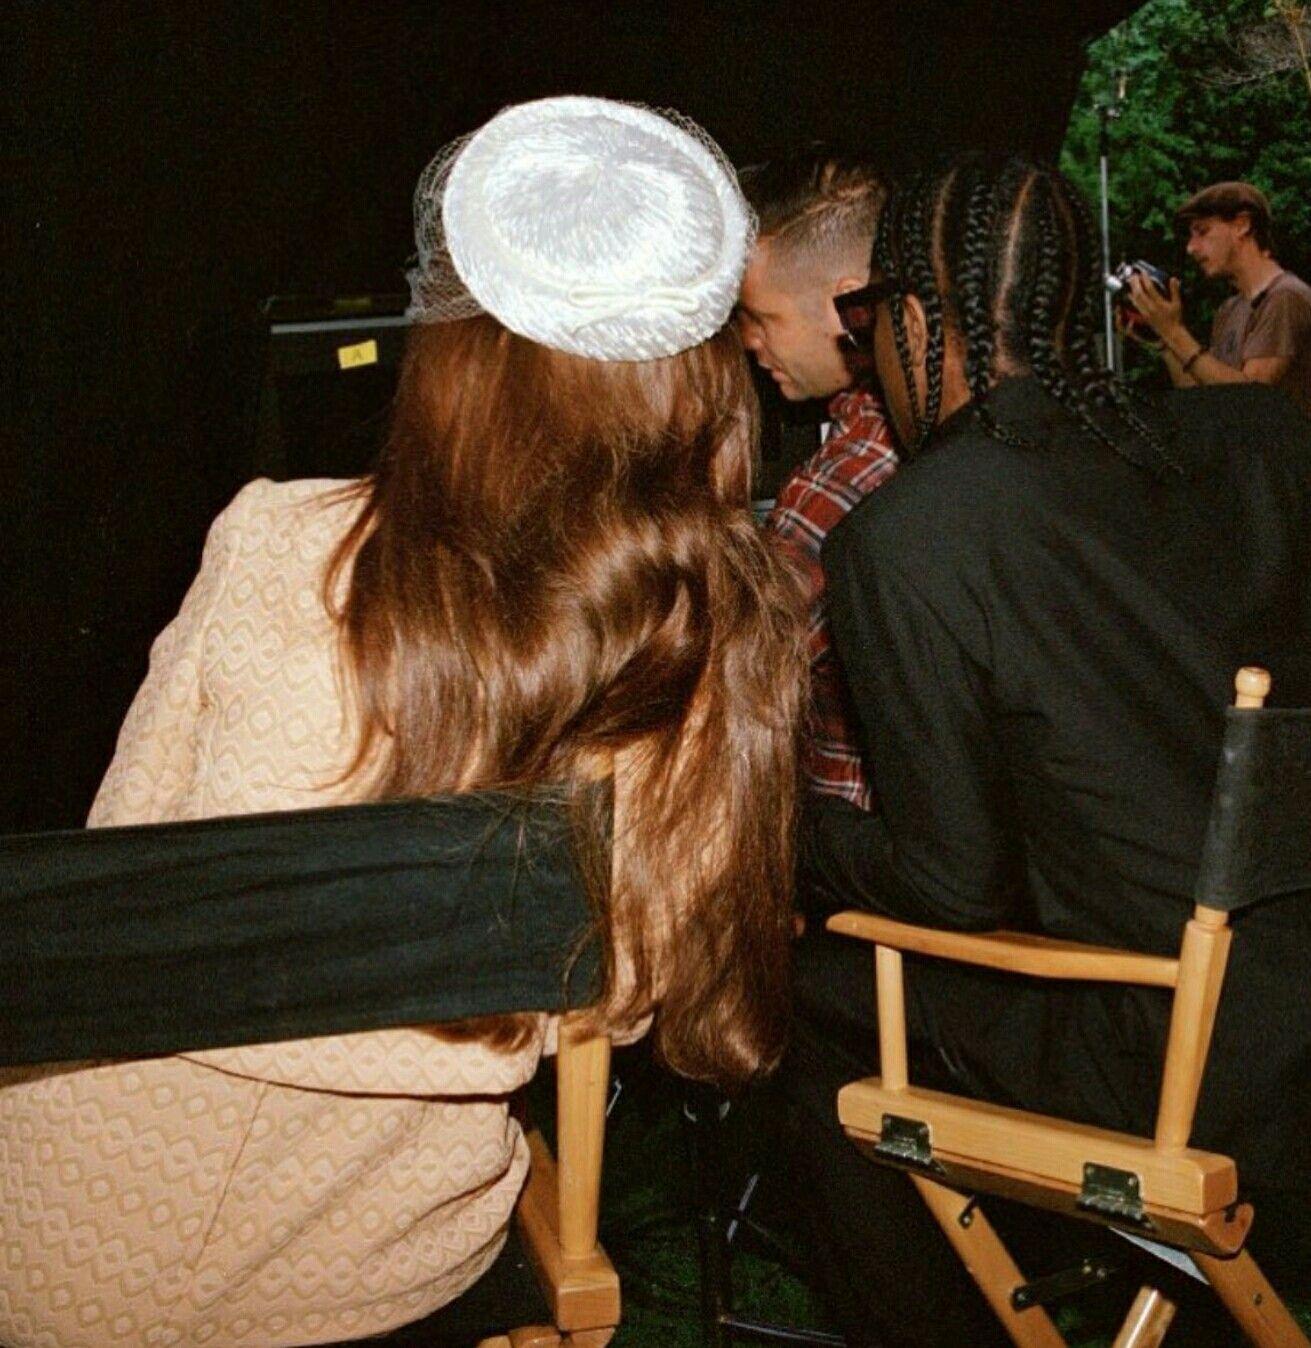 Pin On Lana Del Rey Videography